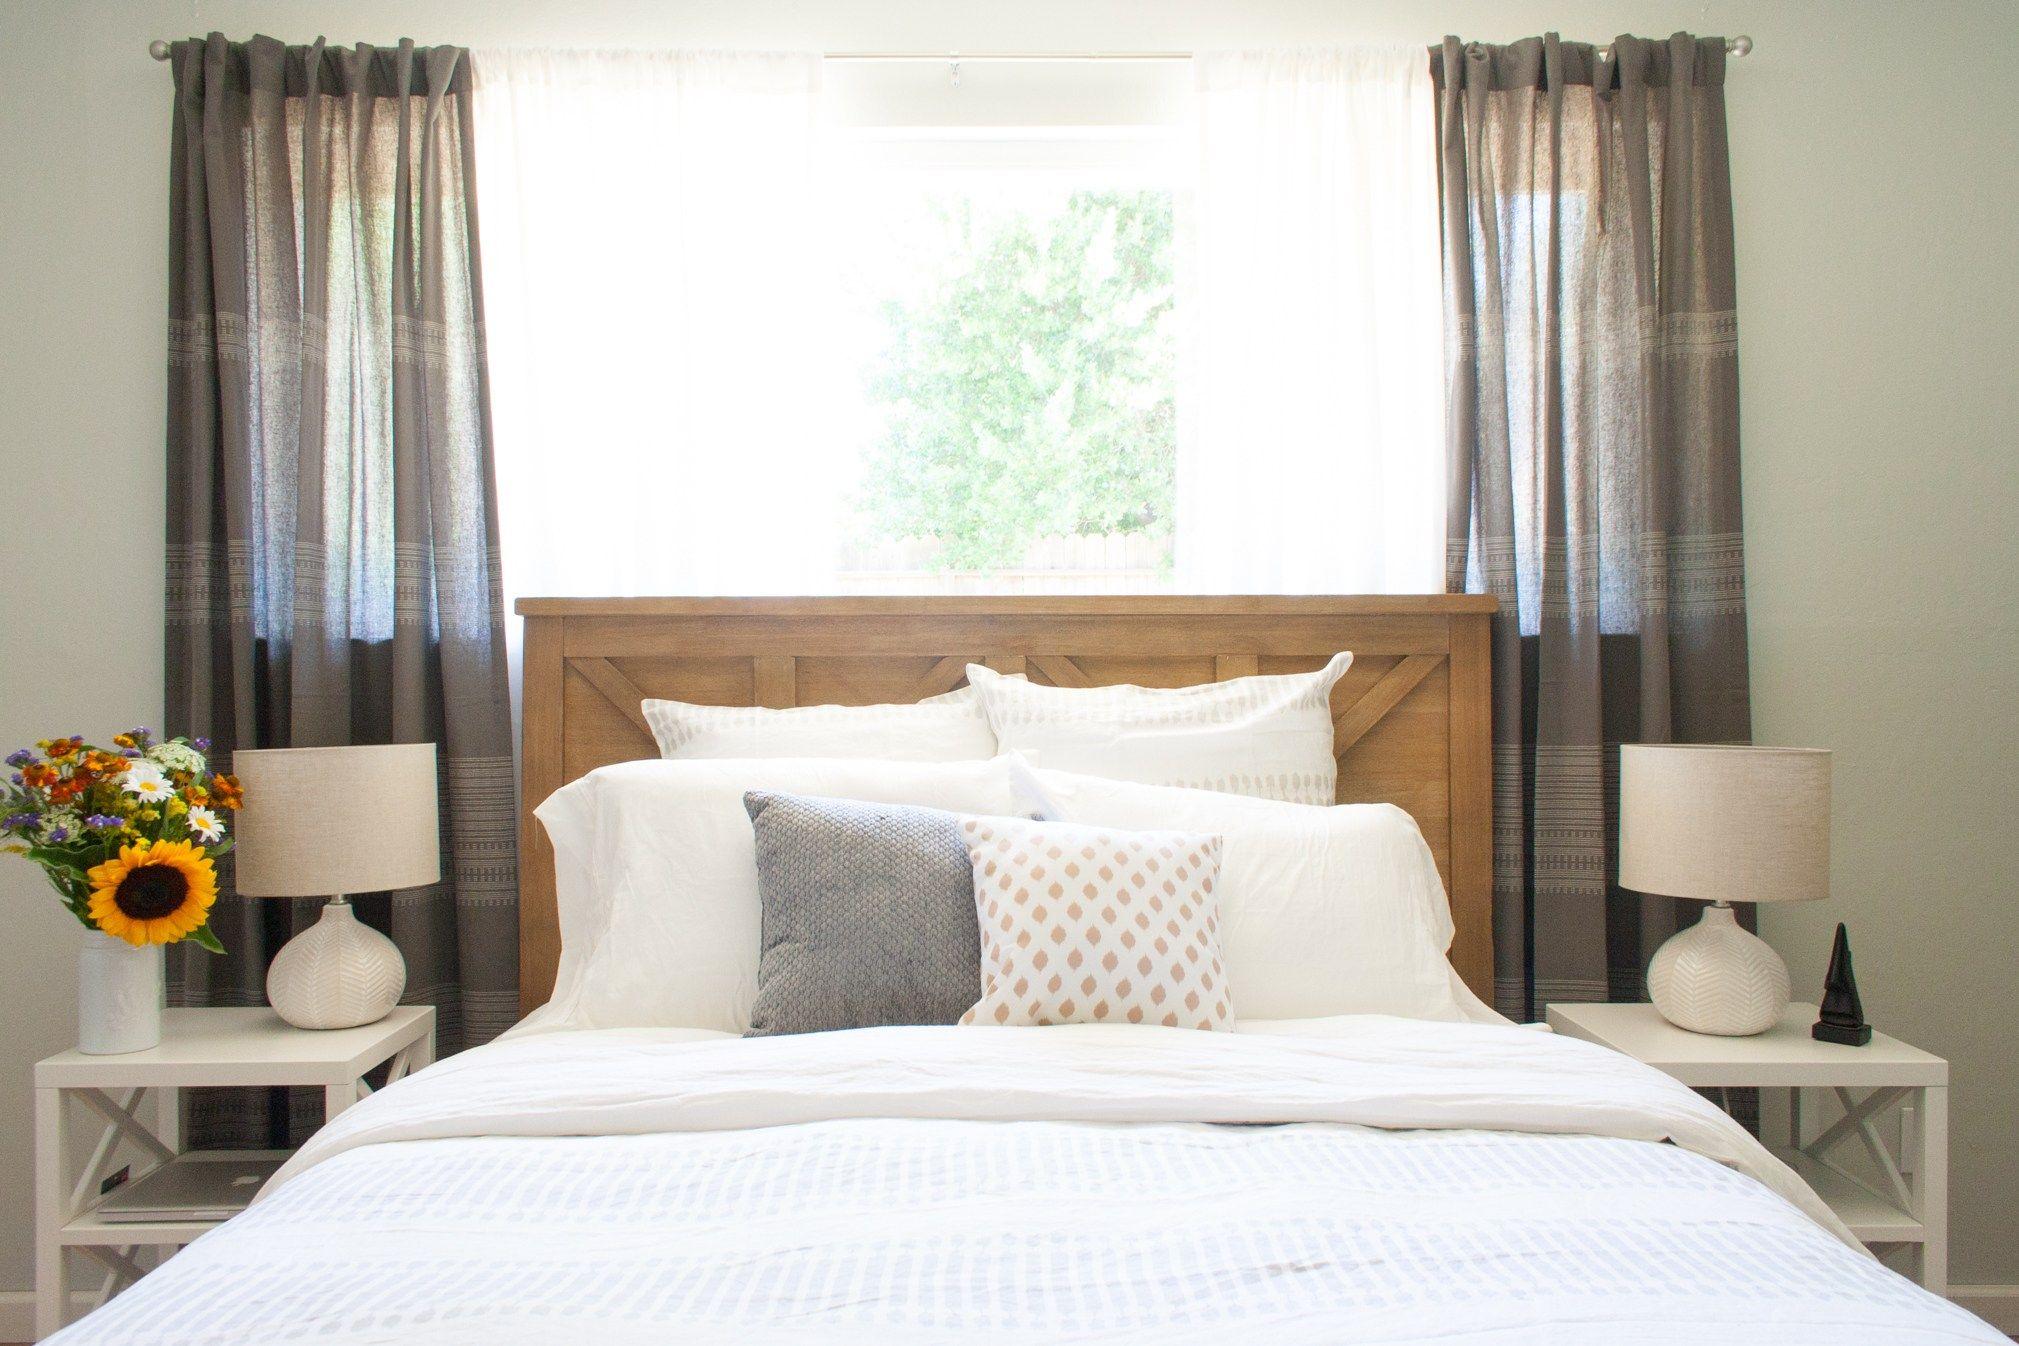 California Bedroom Reveal  interior design / California casual / west elm bedding / target bedroom / bedroom design / bedroom / before and after / target / west elm / world market / e-design